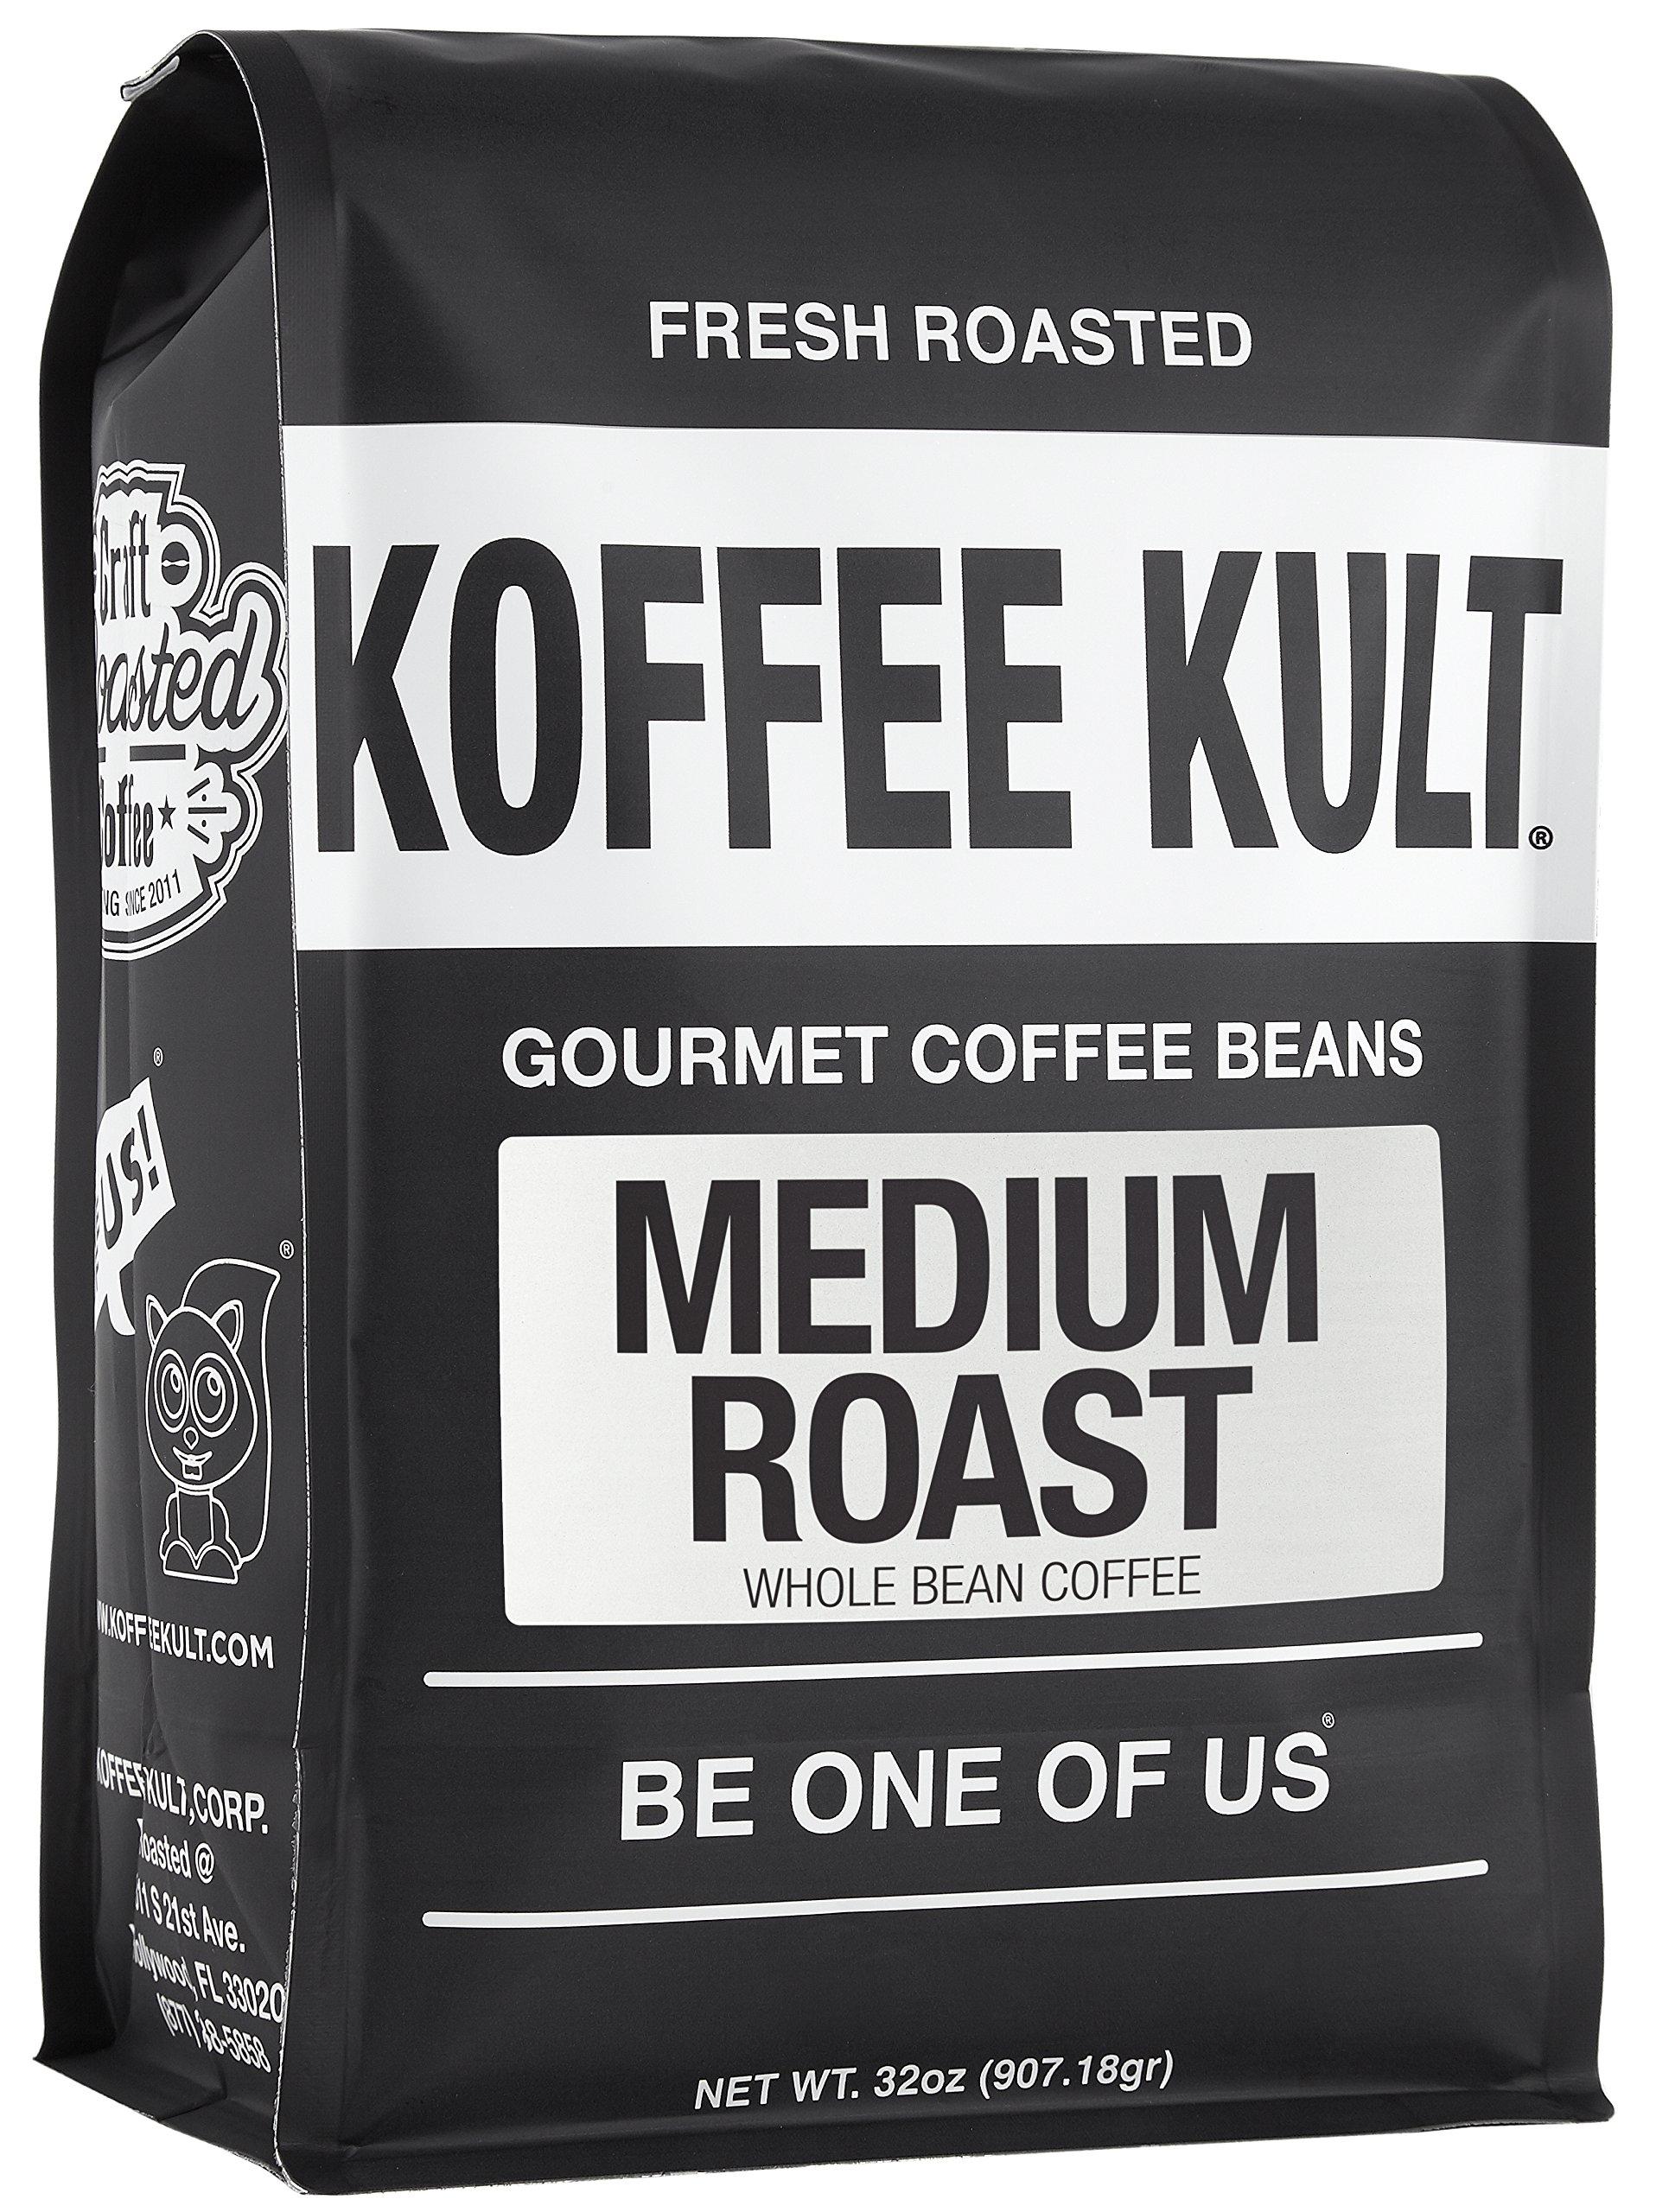 Koffee Kult - Medium Roast Coffee Beans (2 lb Whole Bean) Highest Quality Delicious Coffee - Fresh Gourmet Aromatic Artisan Blend